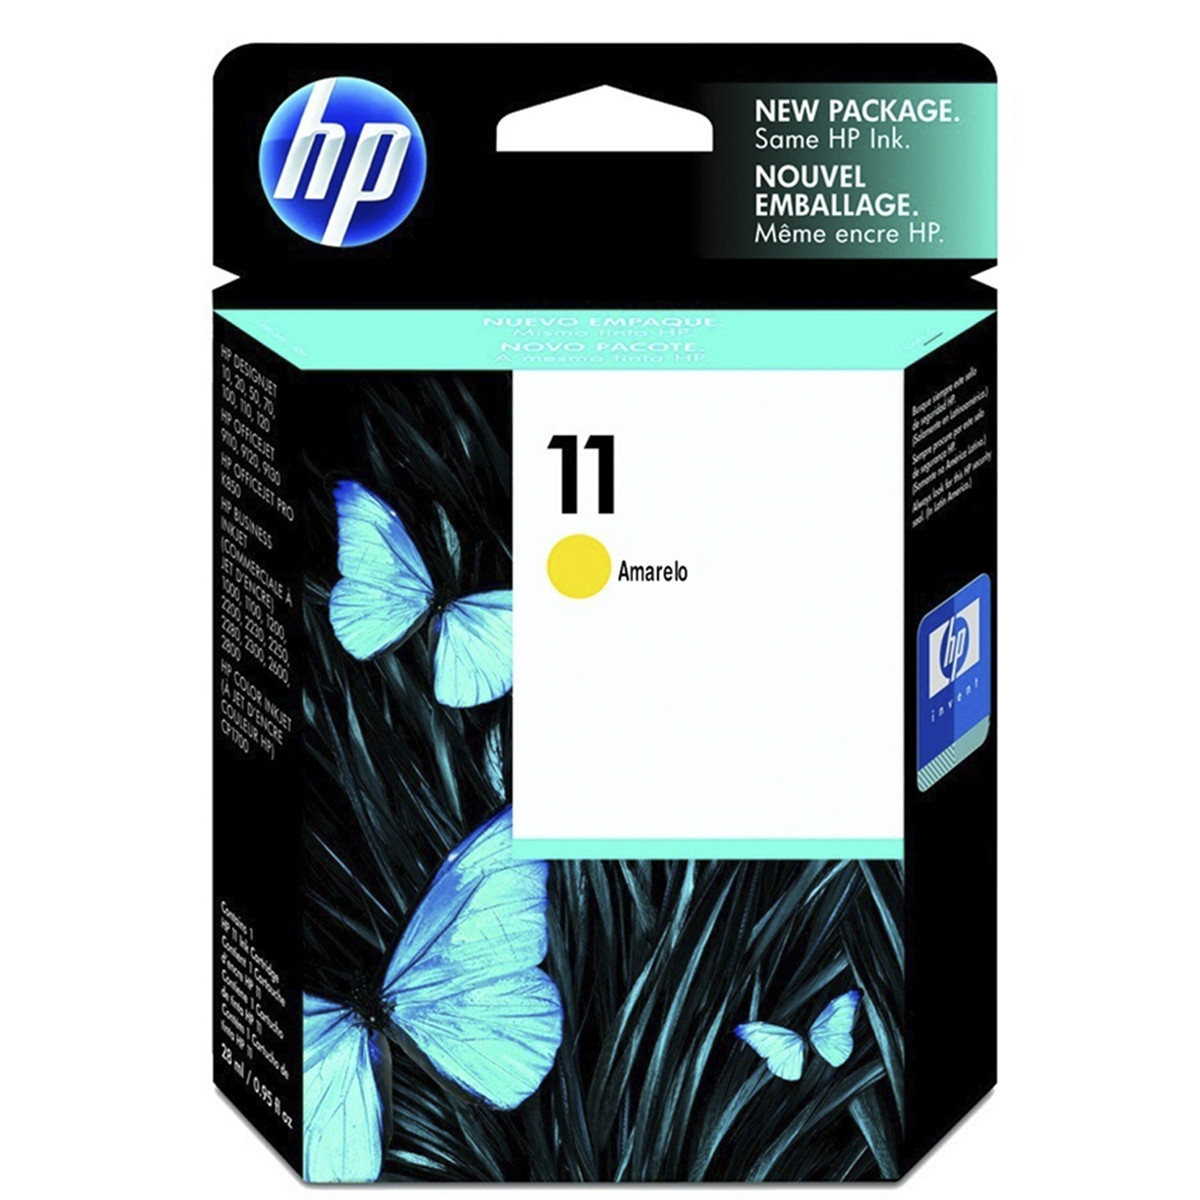 Cartucho de Tinta HP 11 C4838A Amarelo | InkJet 2800 Designjet 110plus Designjet 111 | Original 28ml